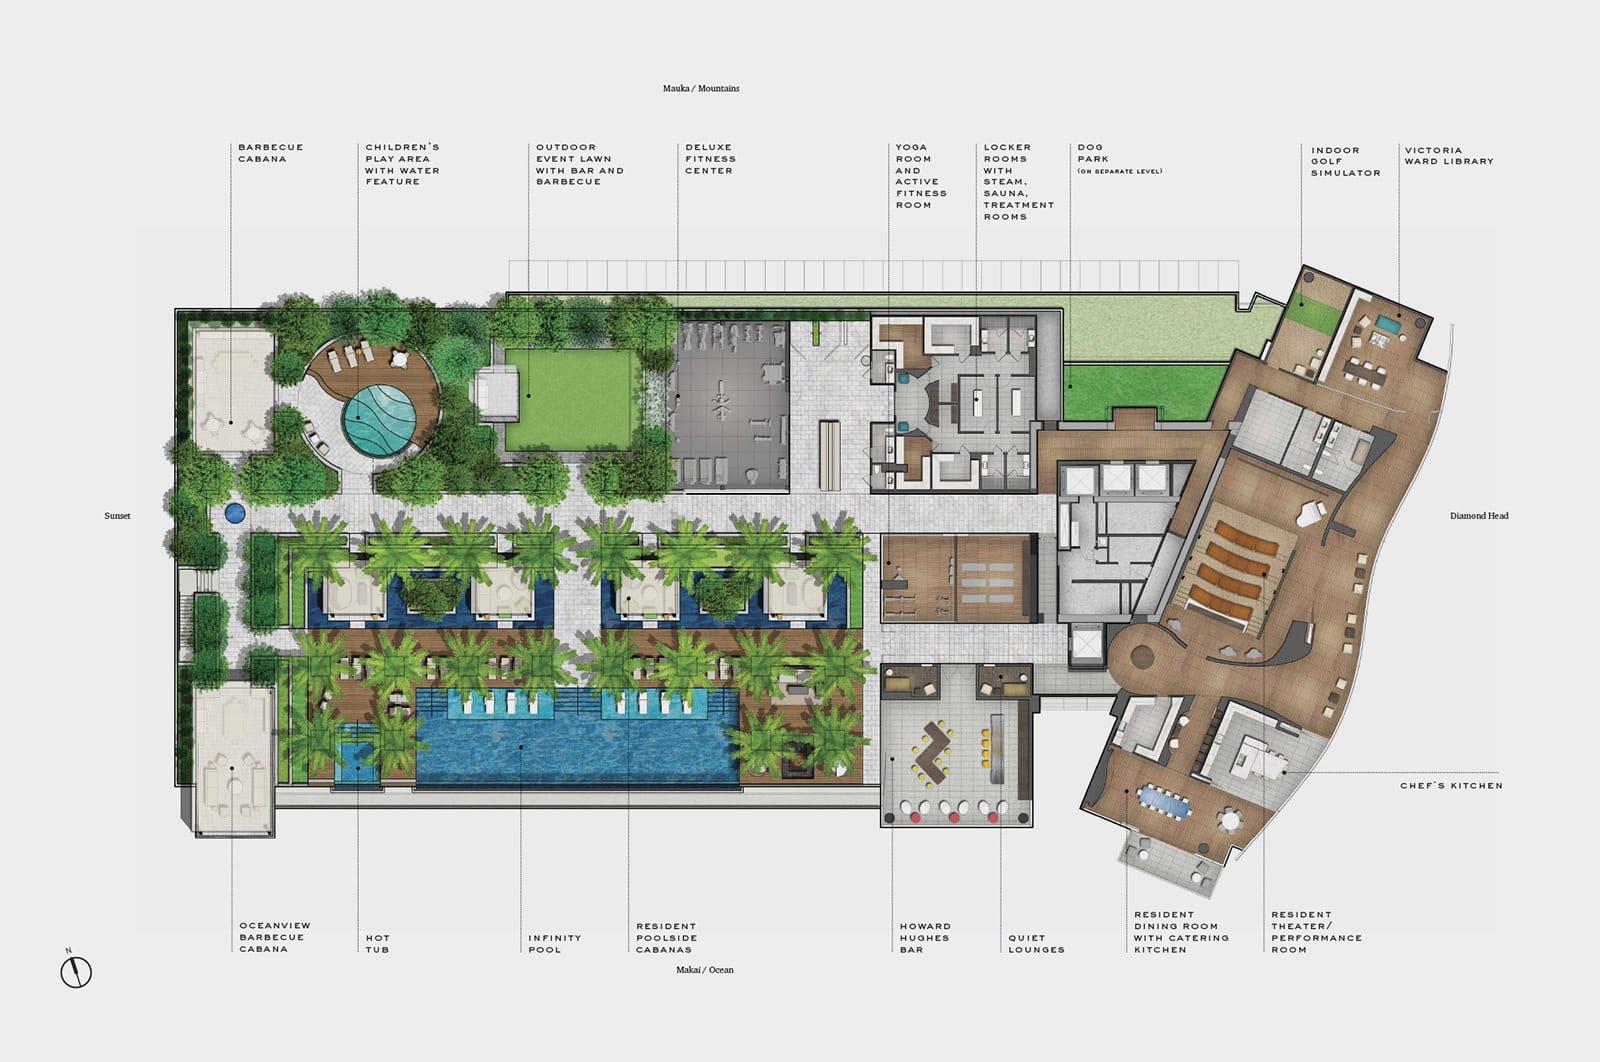 Ward Village Waiea - Amenity Deck